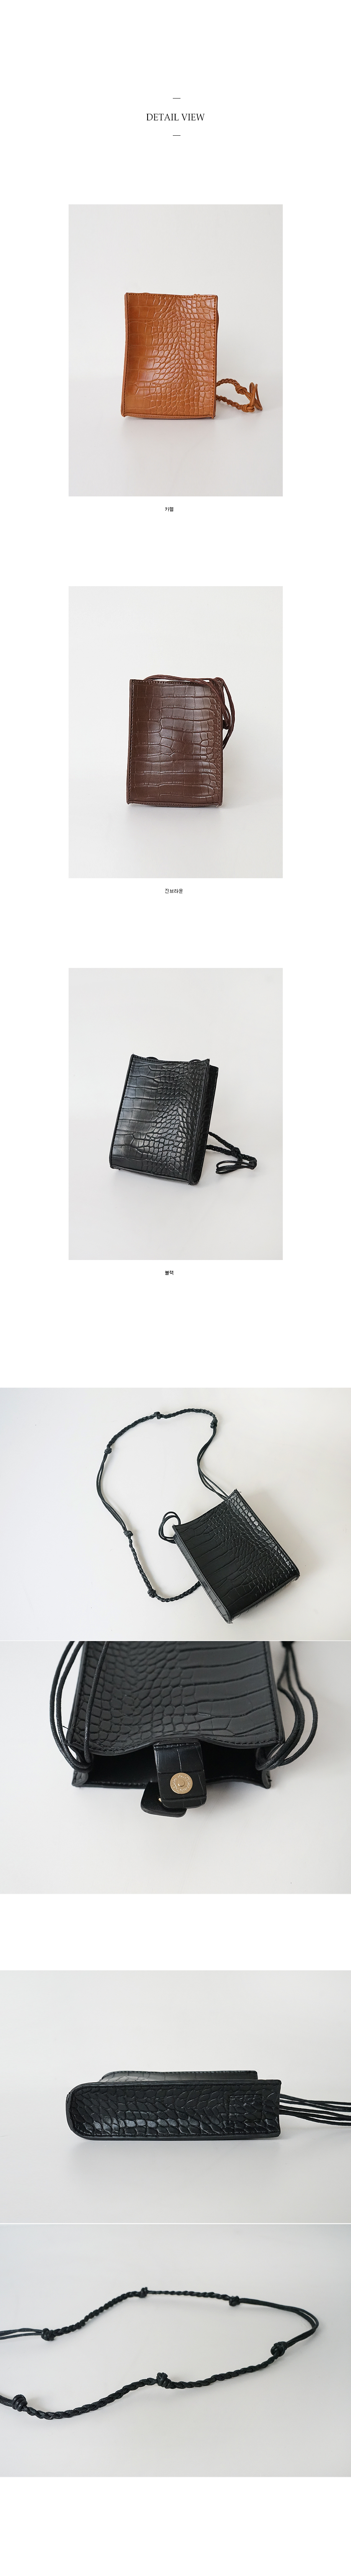 twist strap bag